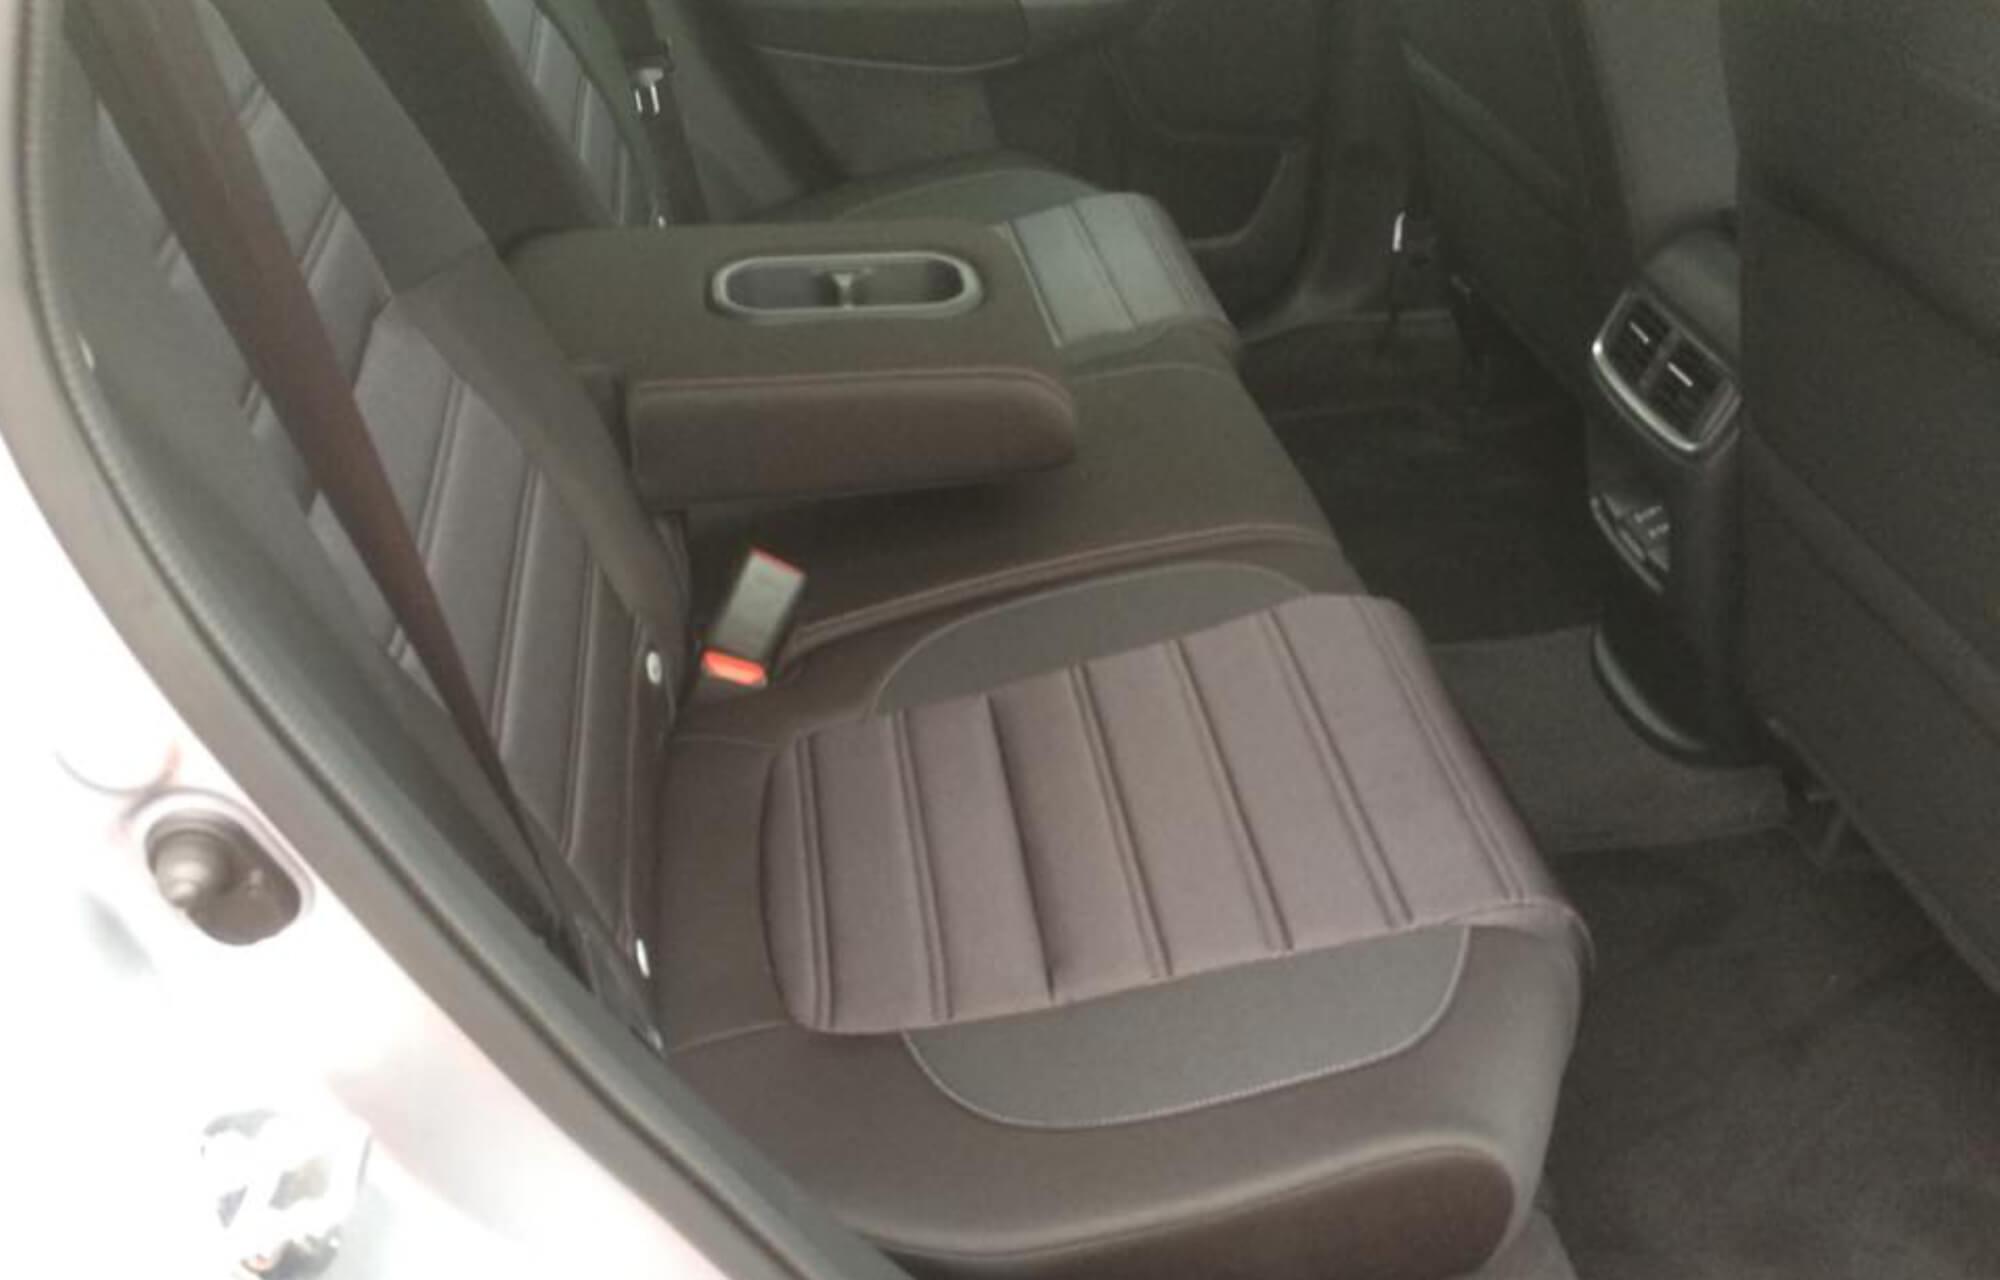 All-New CR-V available now at Denis Kinane Motors